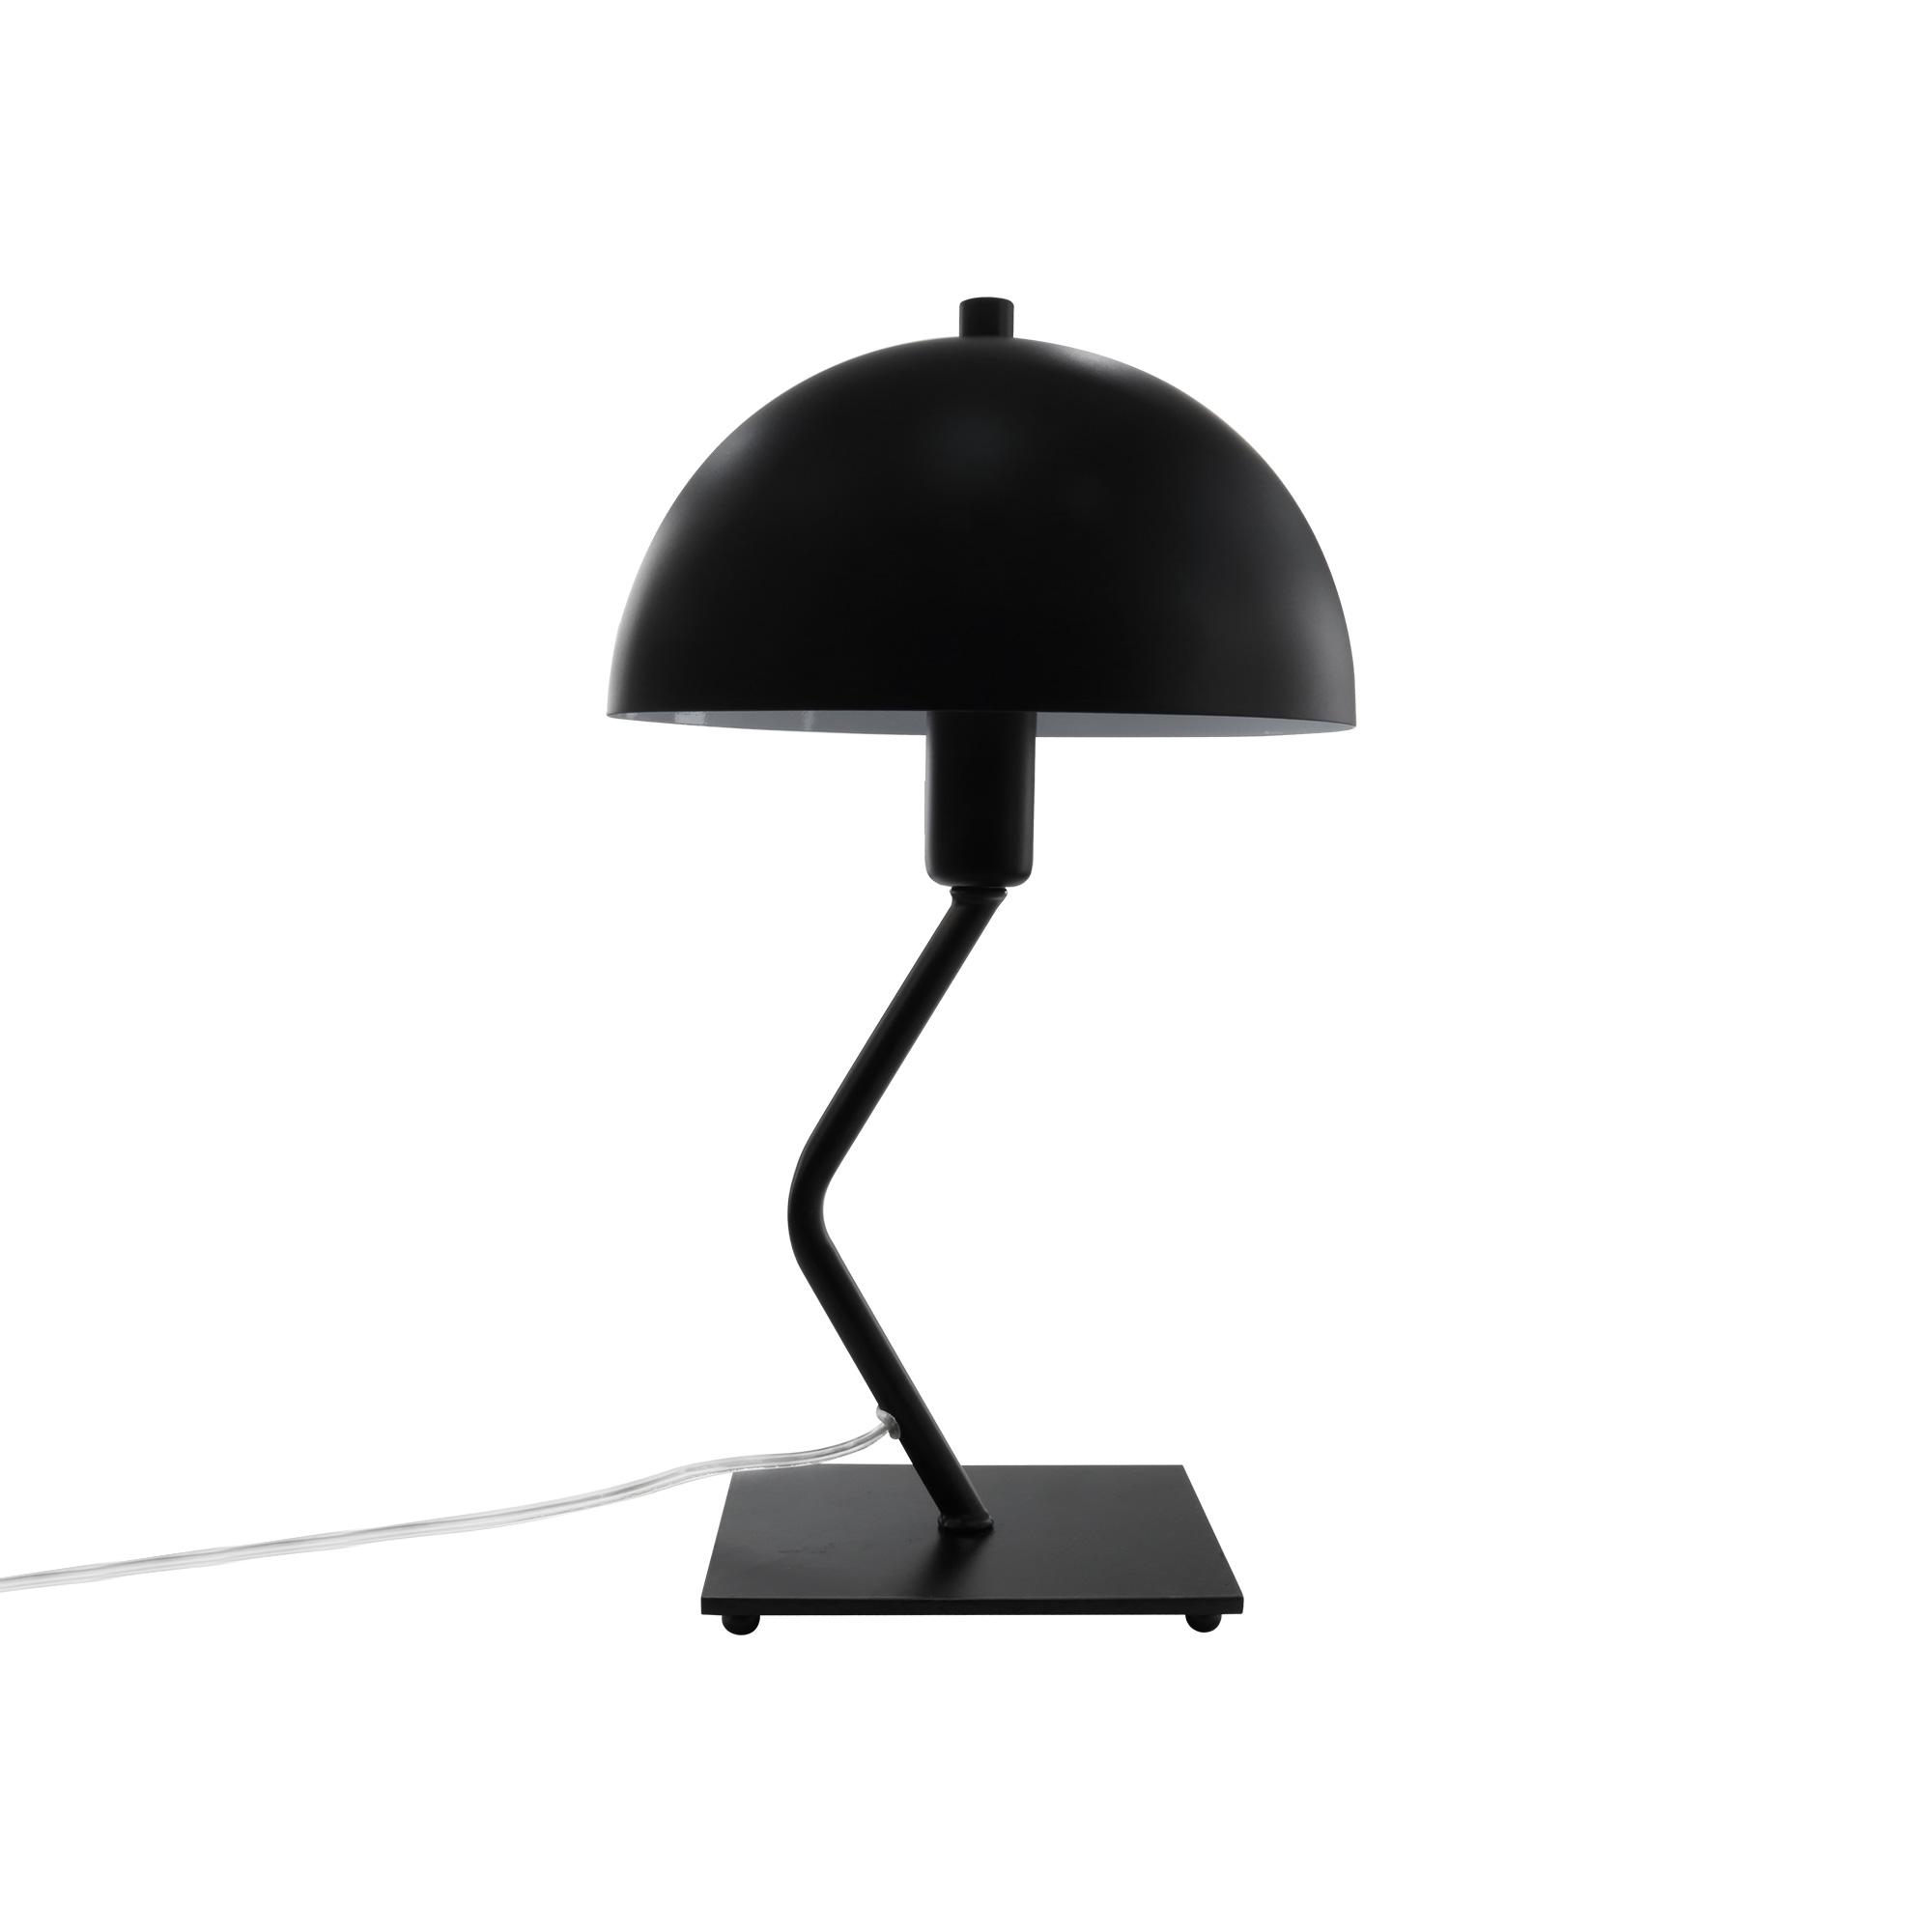 Handla Lighting By Havsö på nätet | Golvshop.se